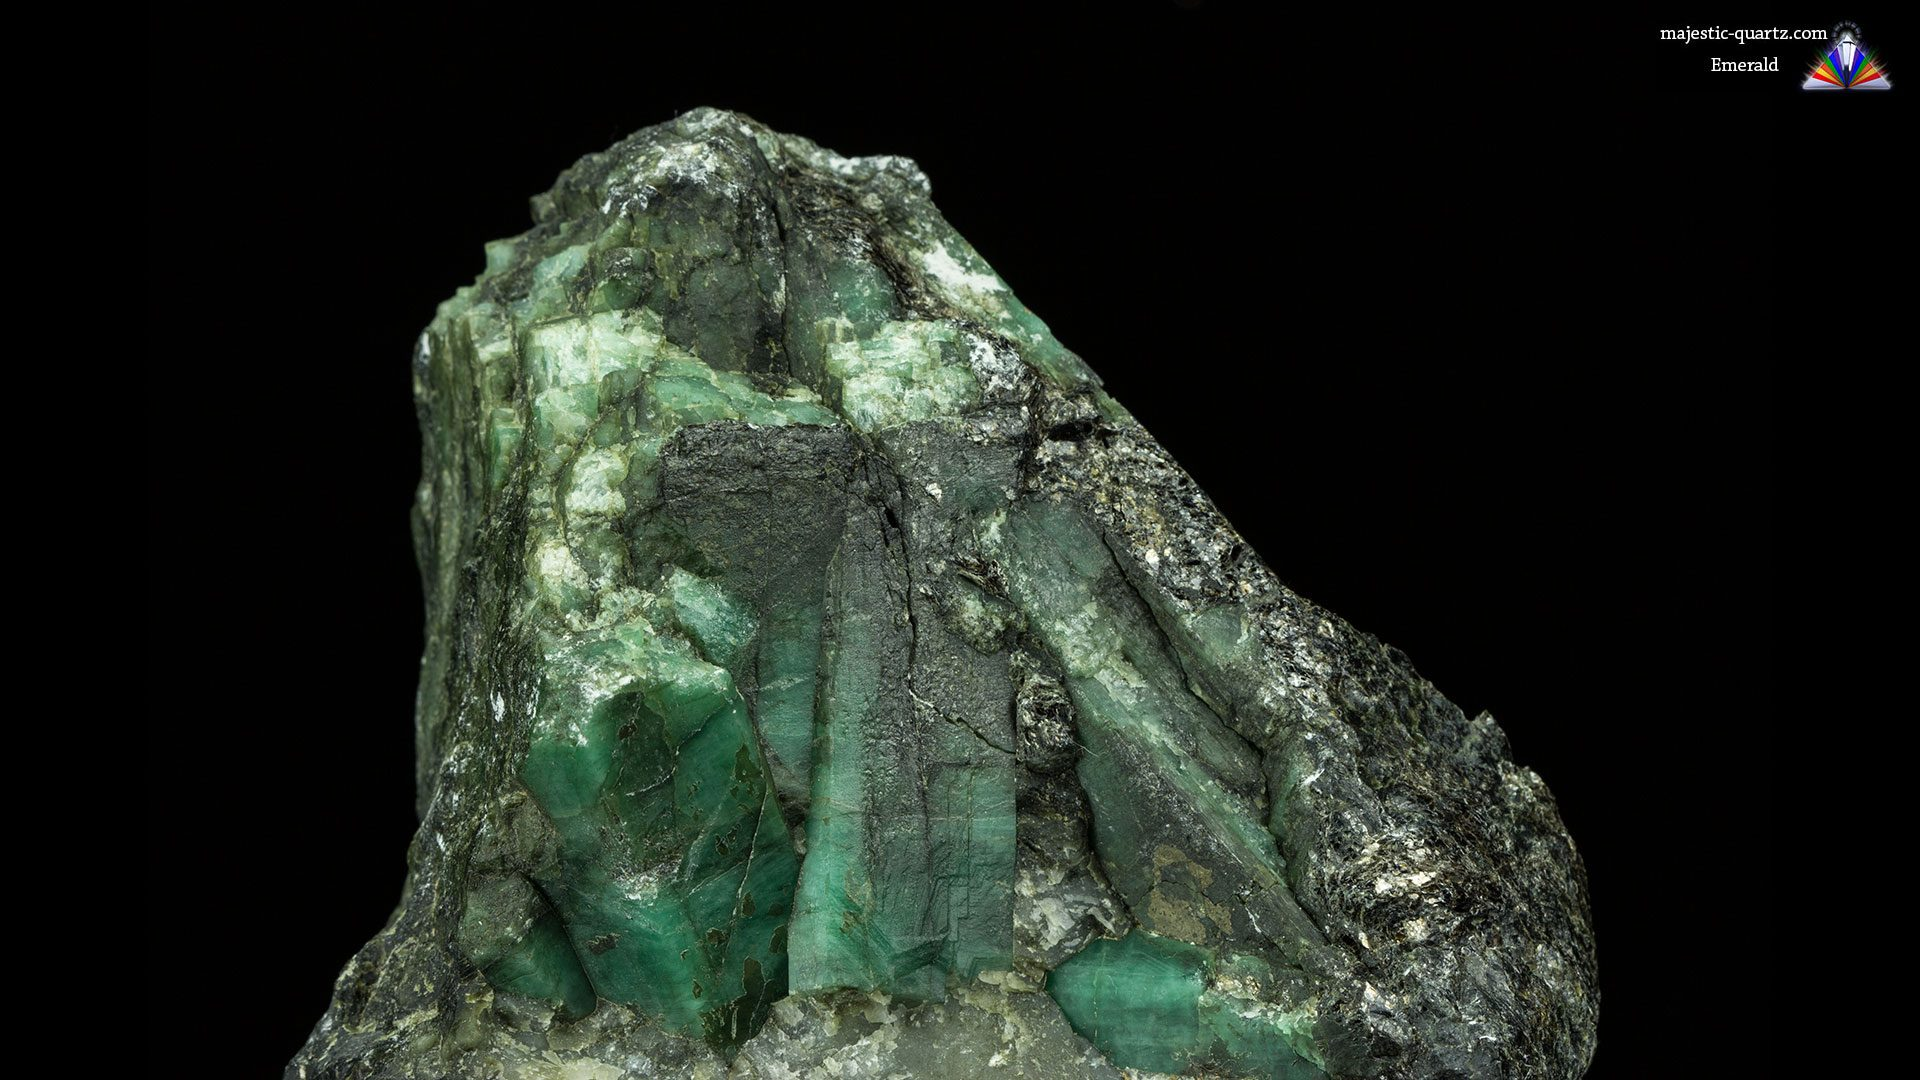 Emerald on Matrix Crystal Specimen - Photograph by Anthony Bradford